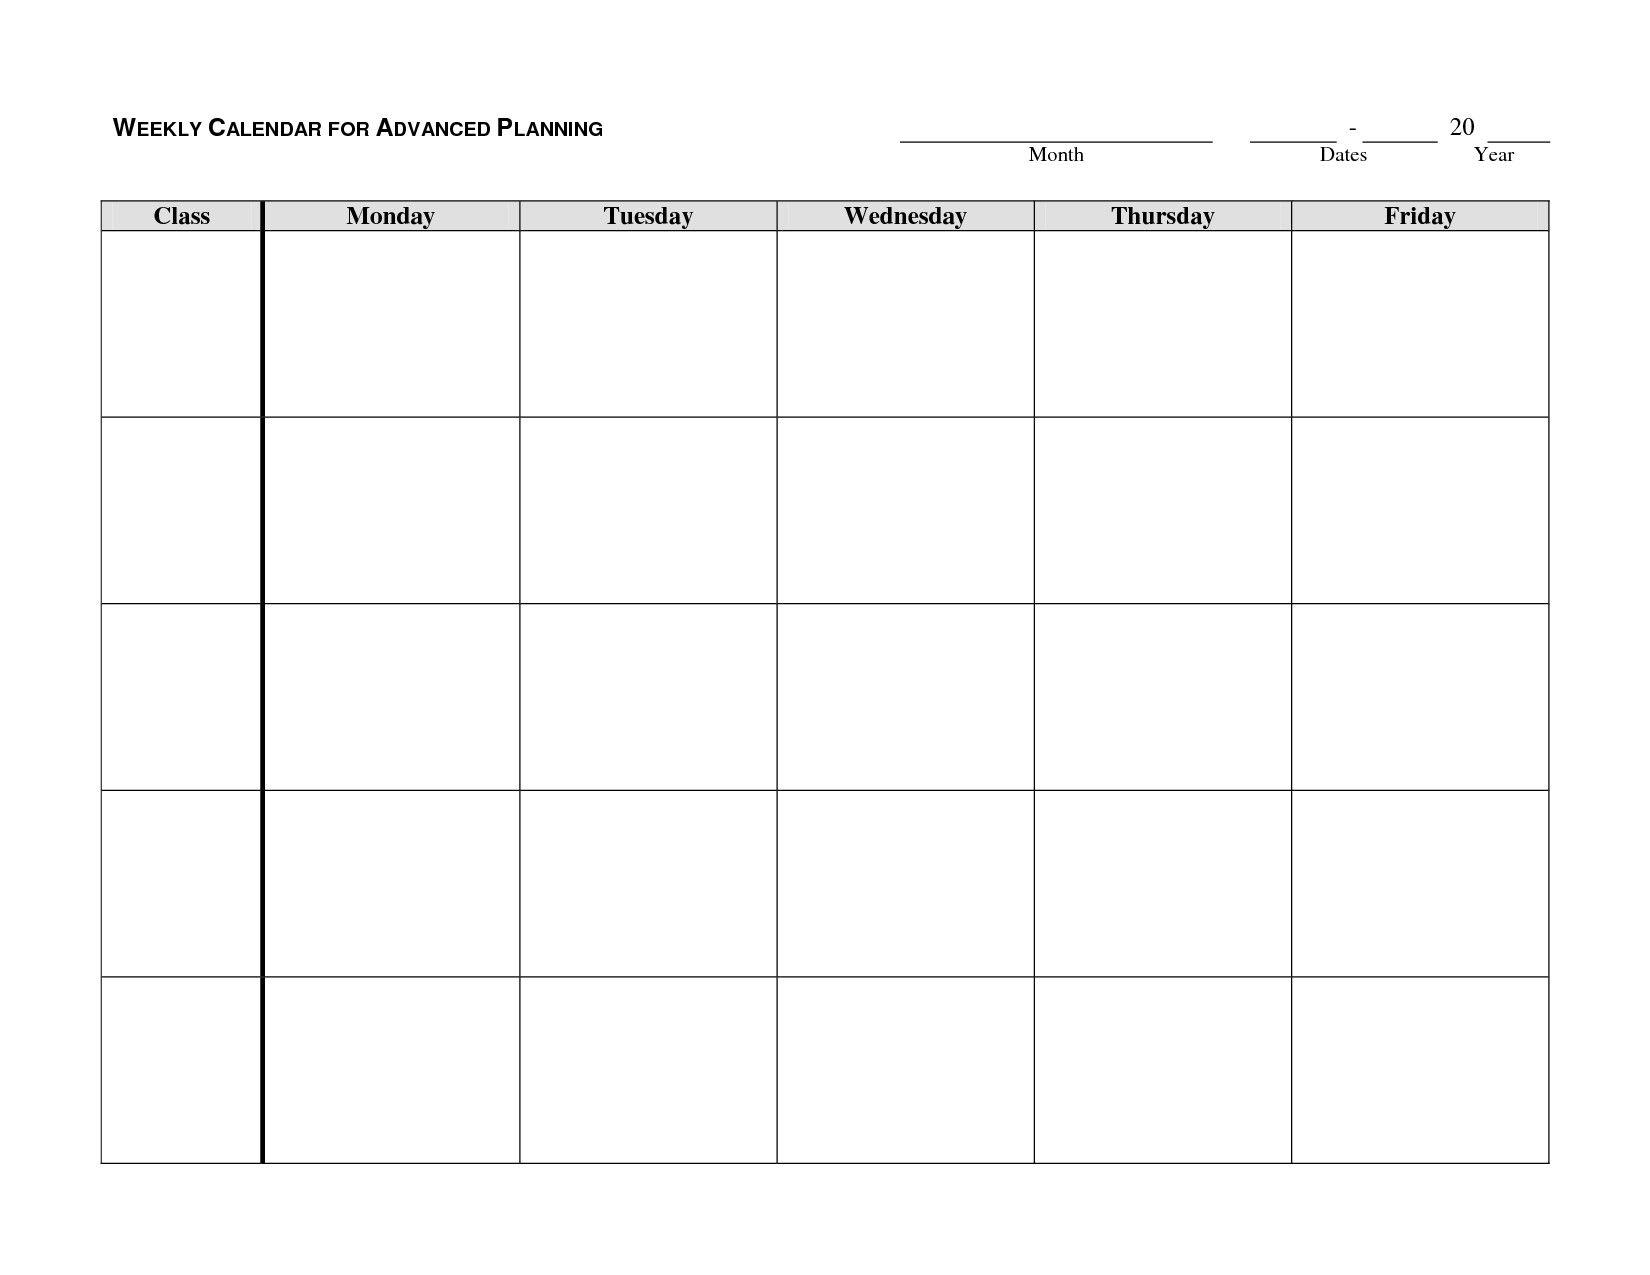 Printable Calendar Monday Through Friday  Yolar.cinetonic with regard to Sunday To Saturday Week Calendar